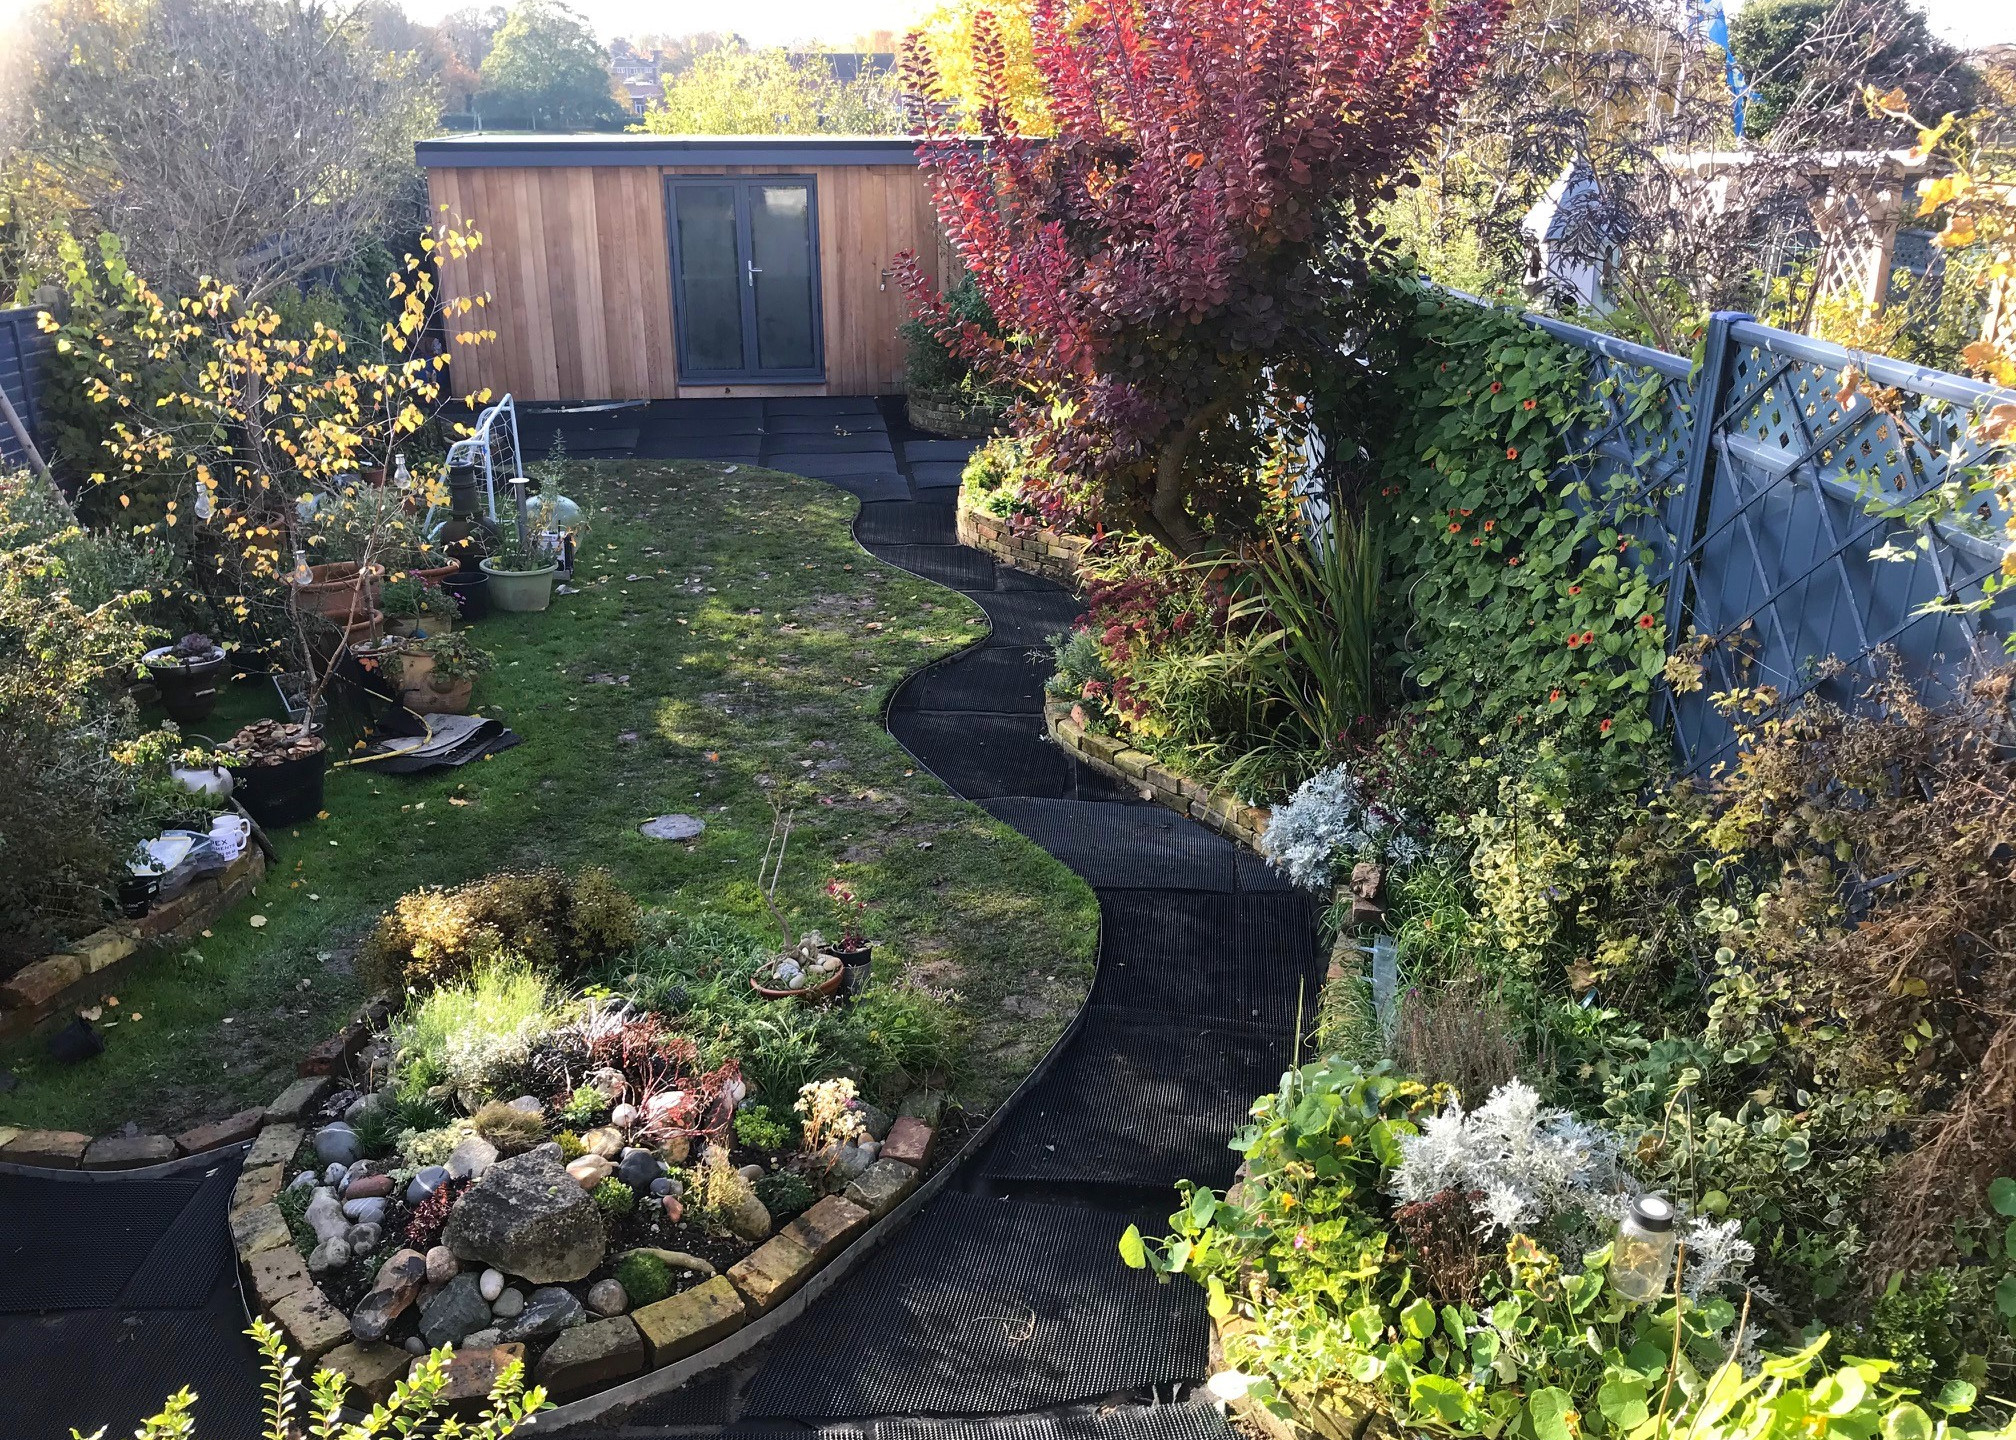 Path laid with matting